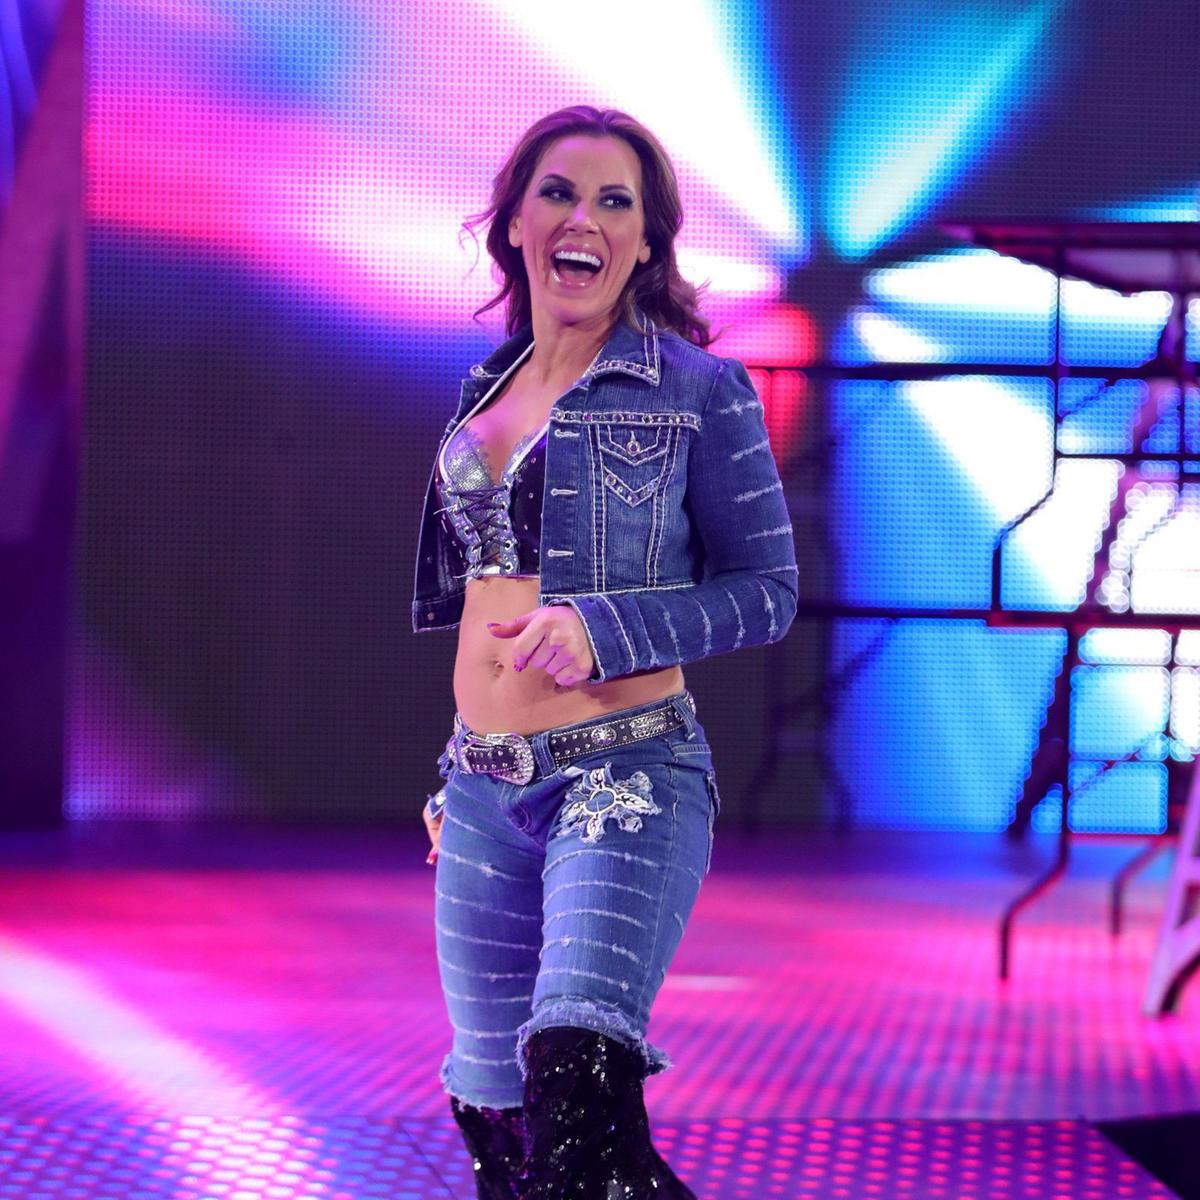 Alexa Bliss vs. Mickie James - Campeonato Femenil de Raw: fotos | WWE